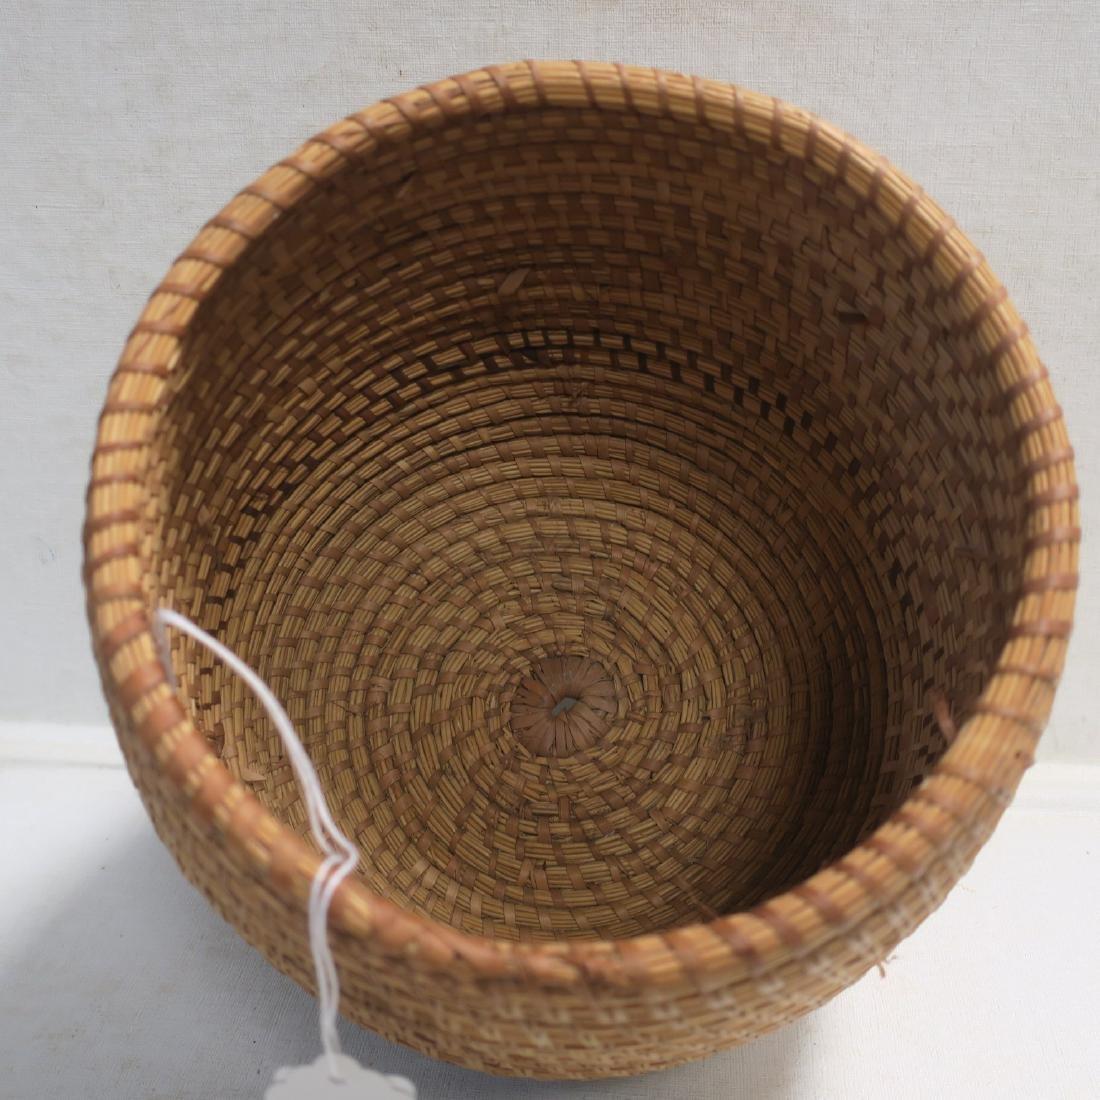 Handmade Natural Woven Coil Basket: - 3